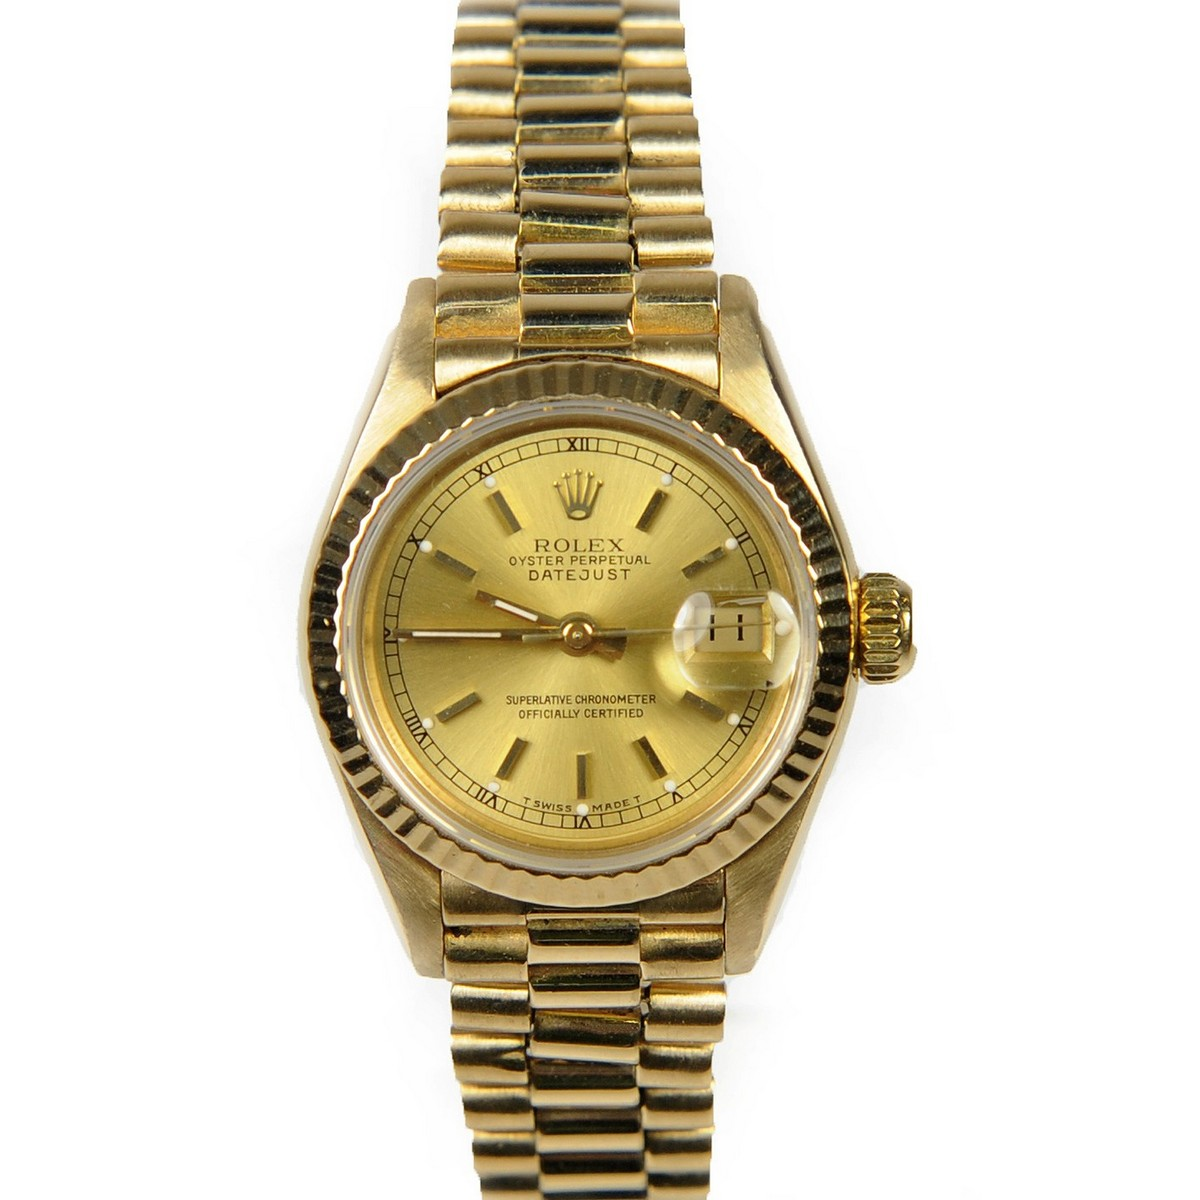 Rolex Ladies Presidential Ref: 69178 model watch